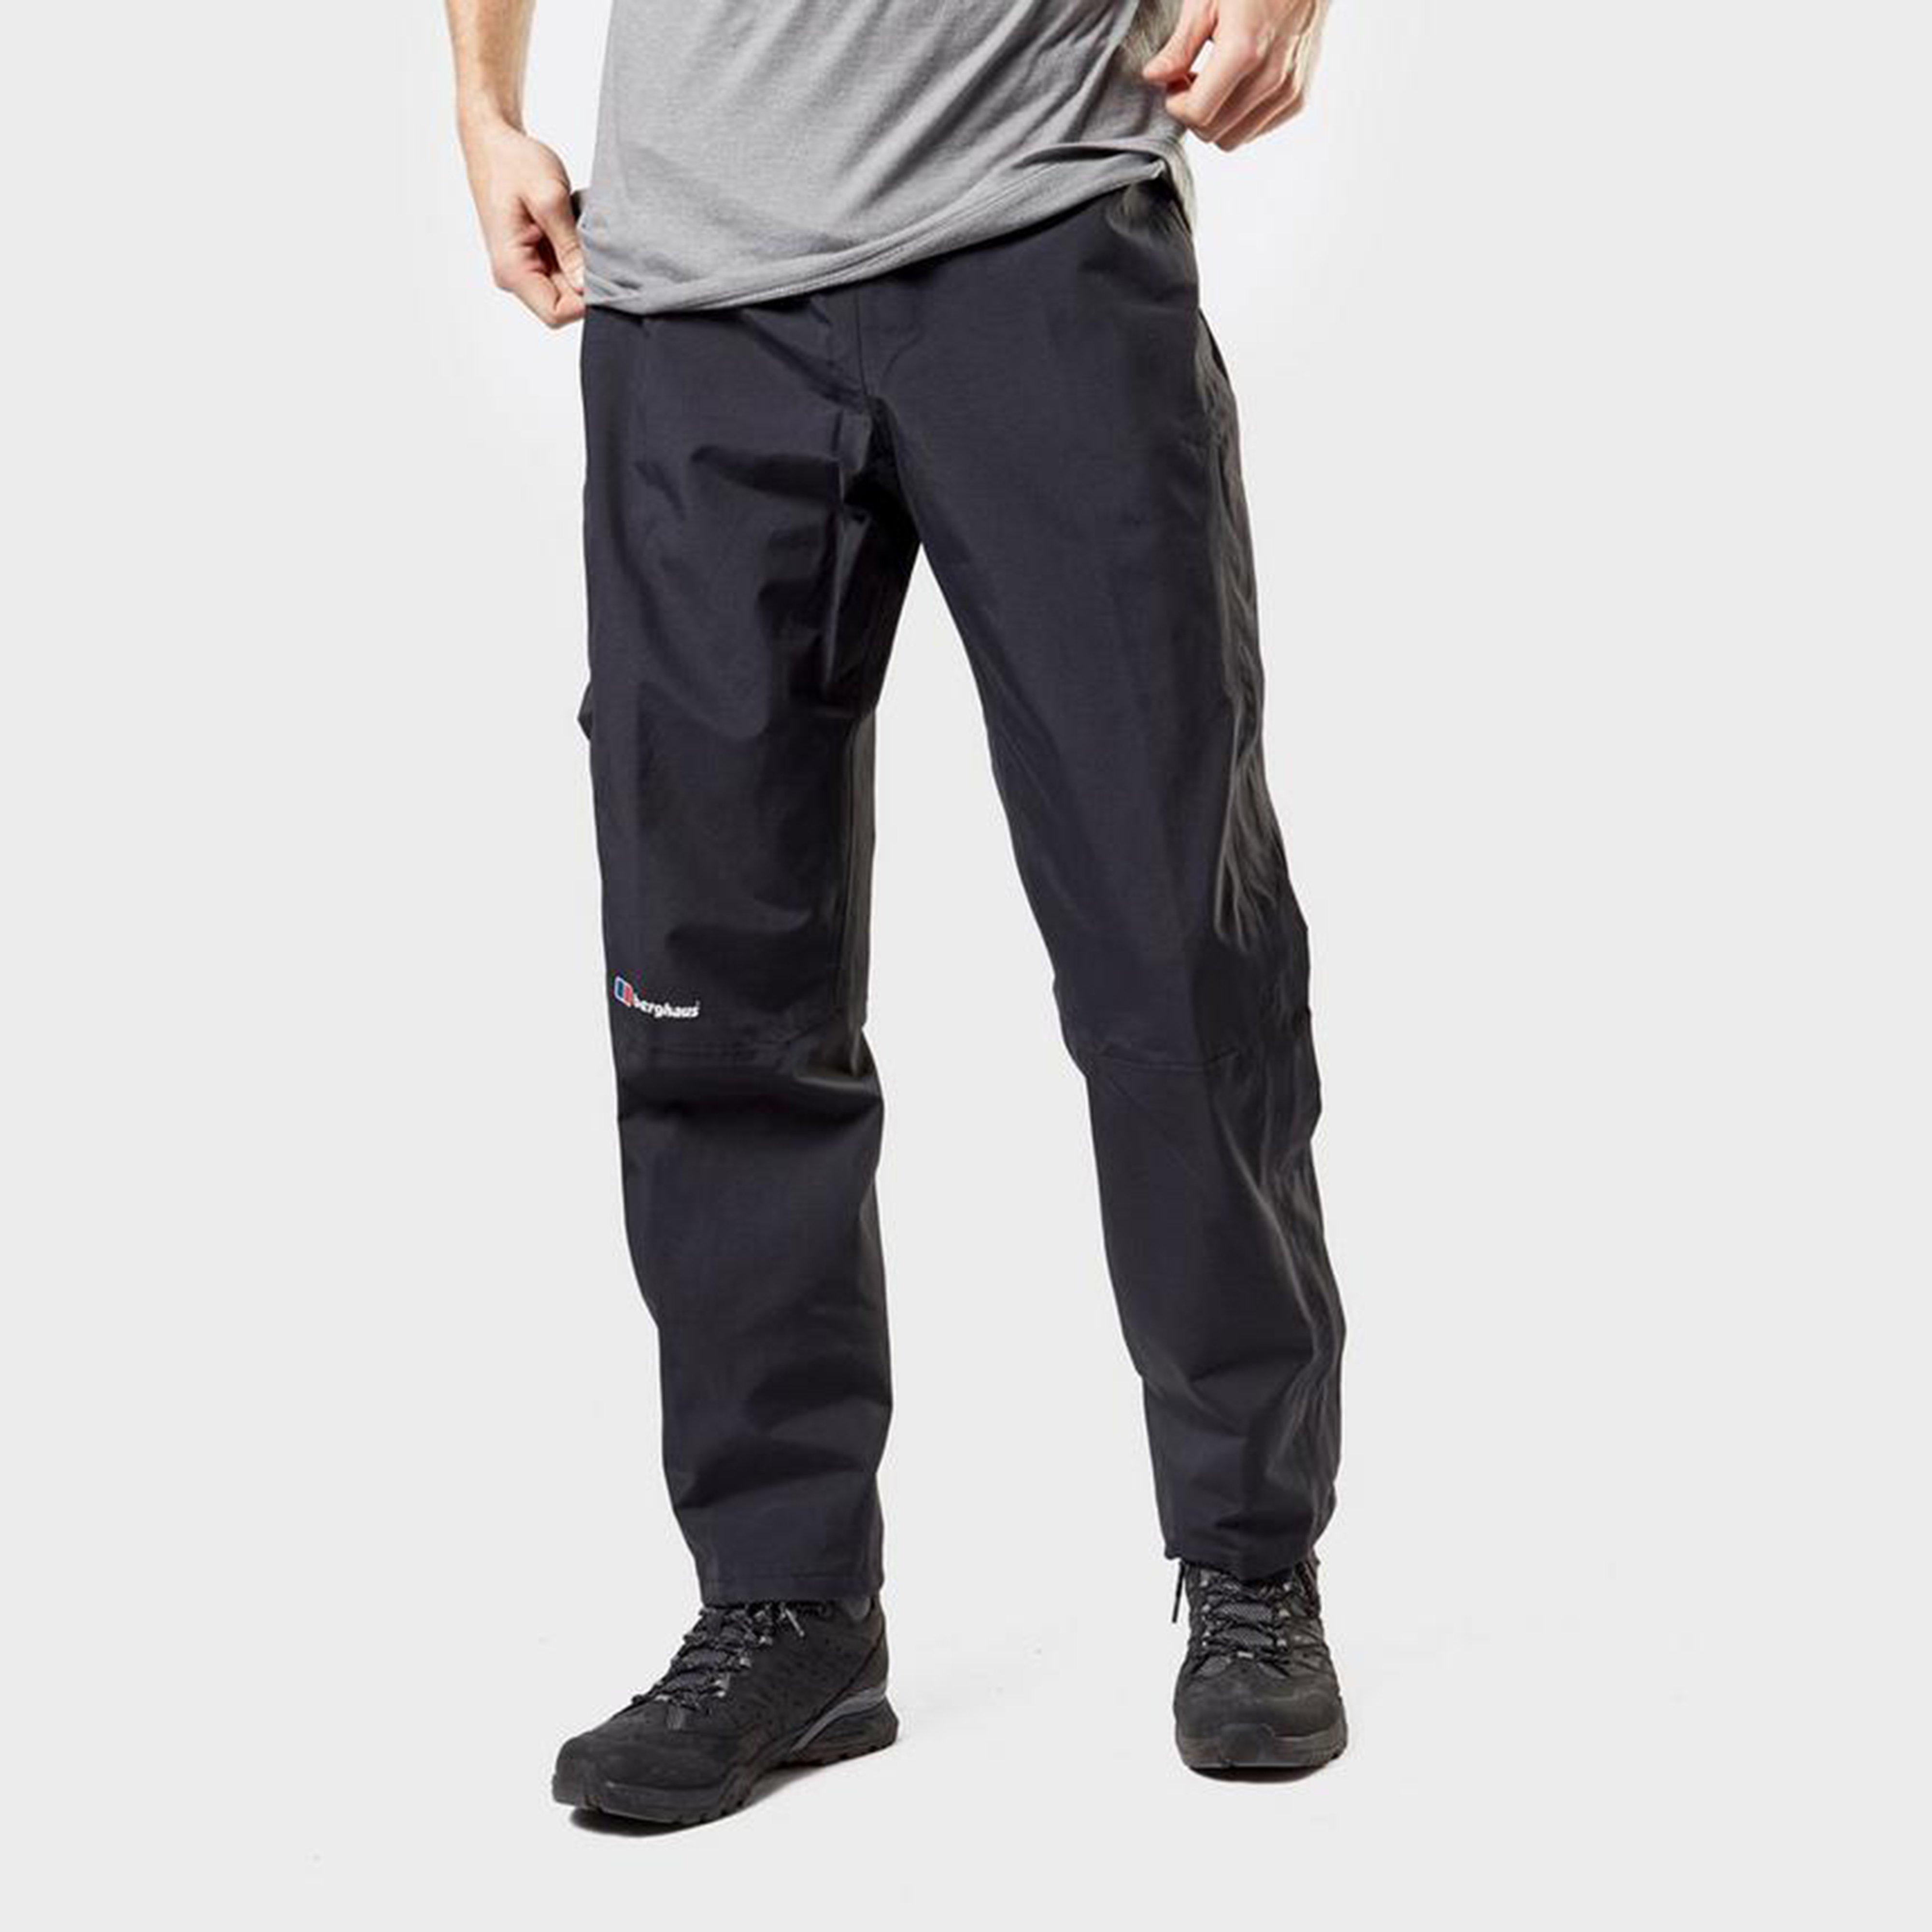 Berghaus Mens Maitland Gore-tex Overtrousers (short) - Black/s  Black/s